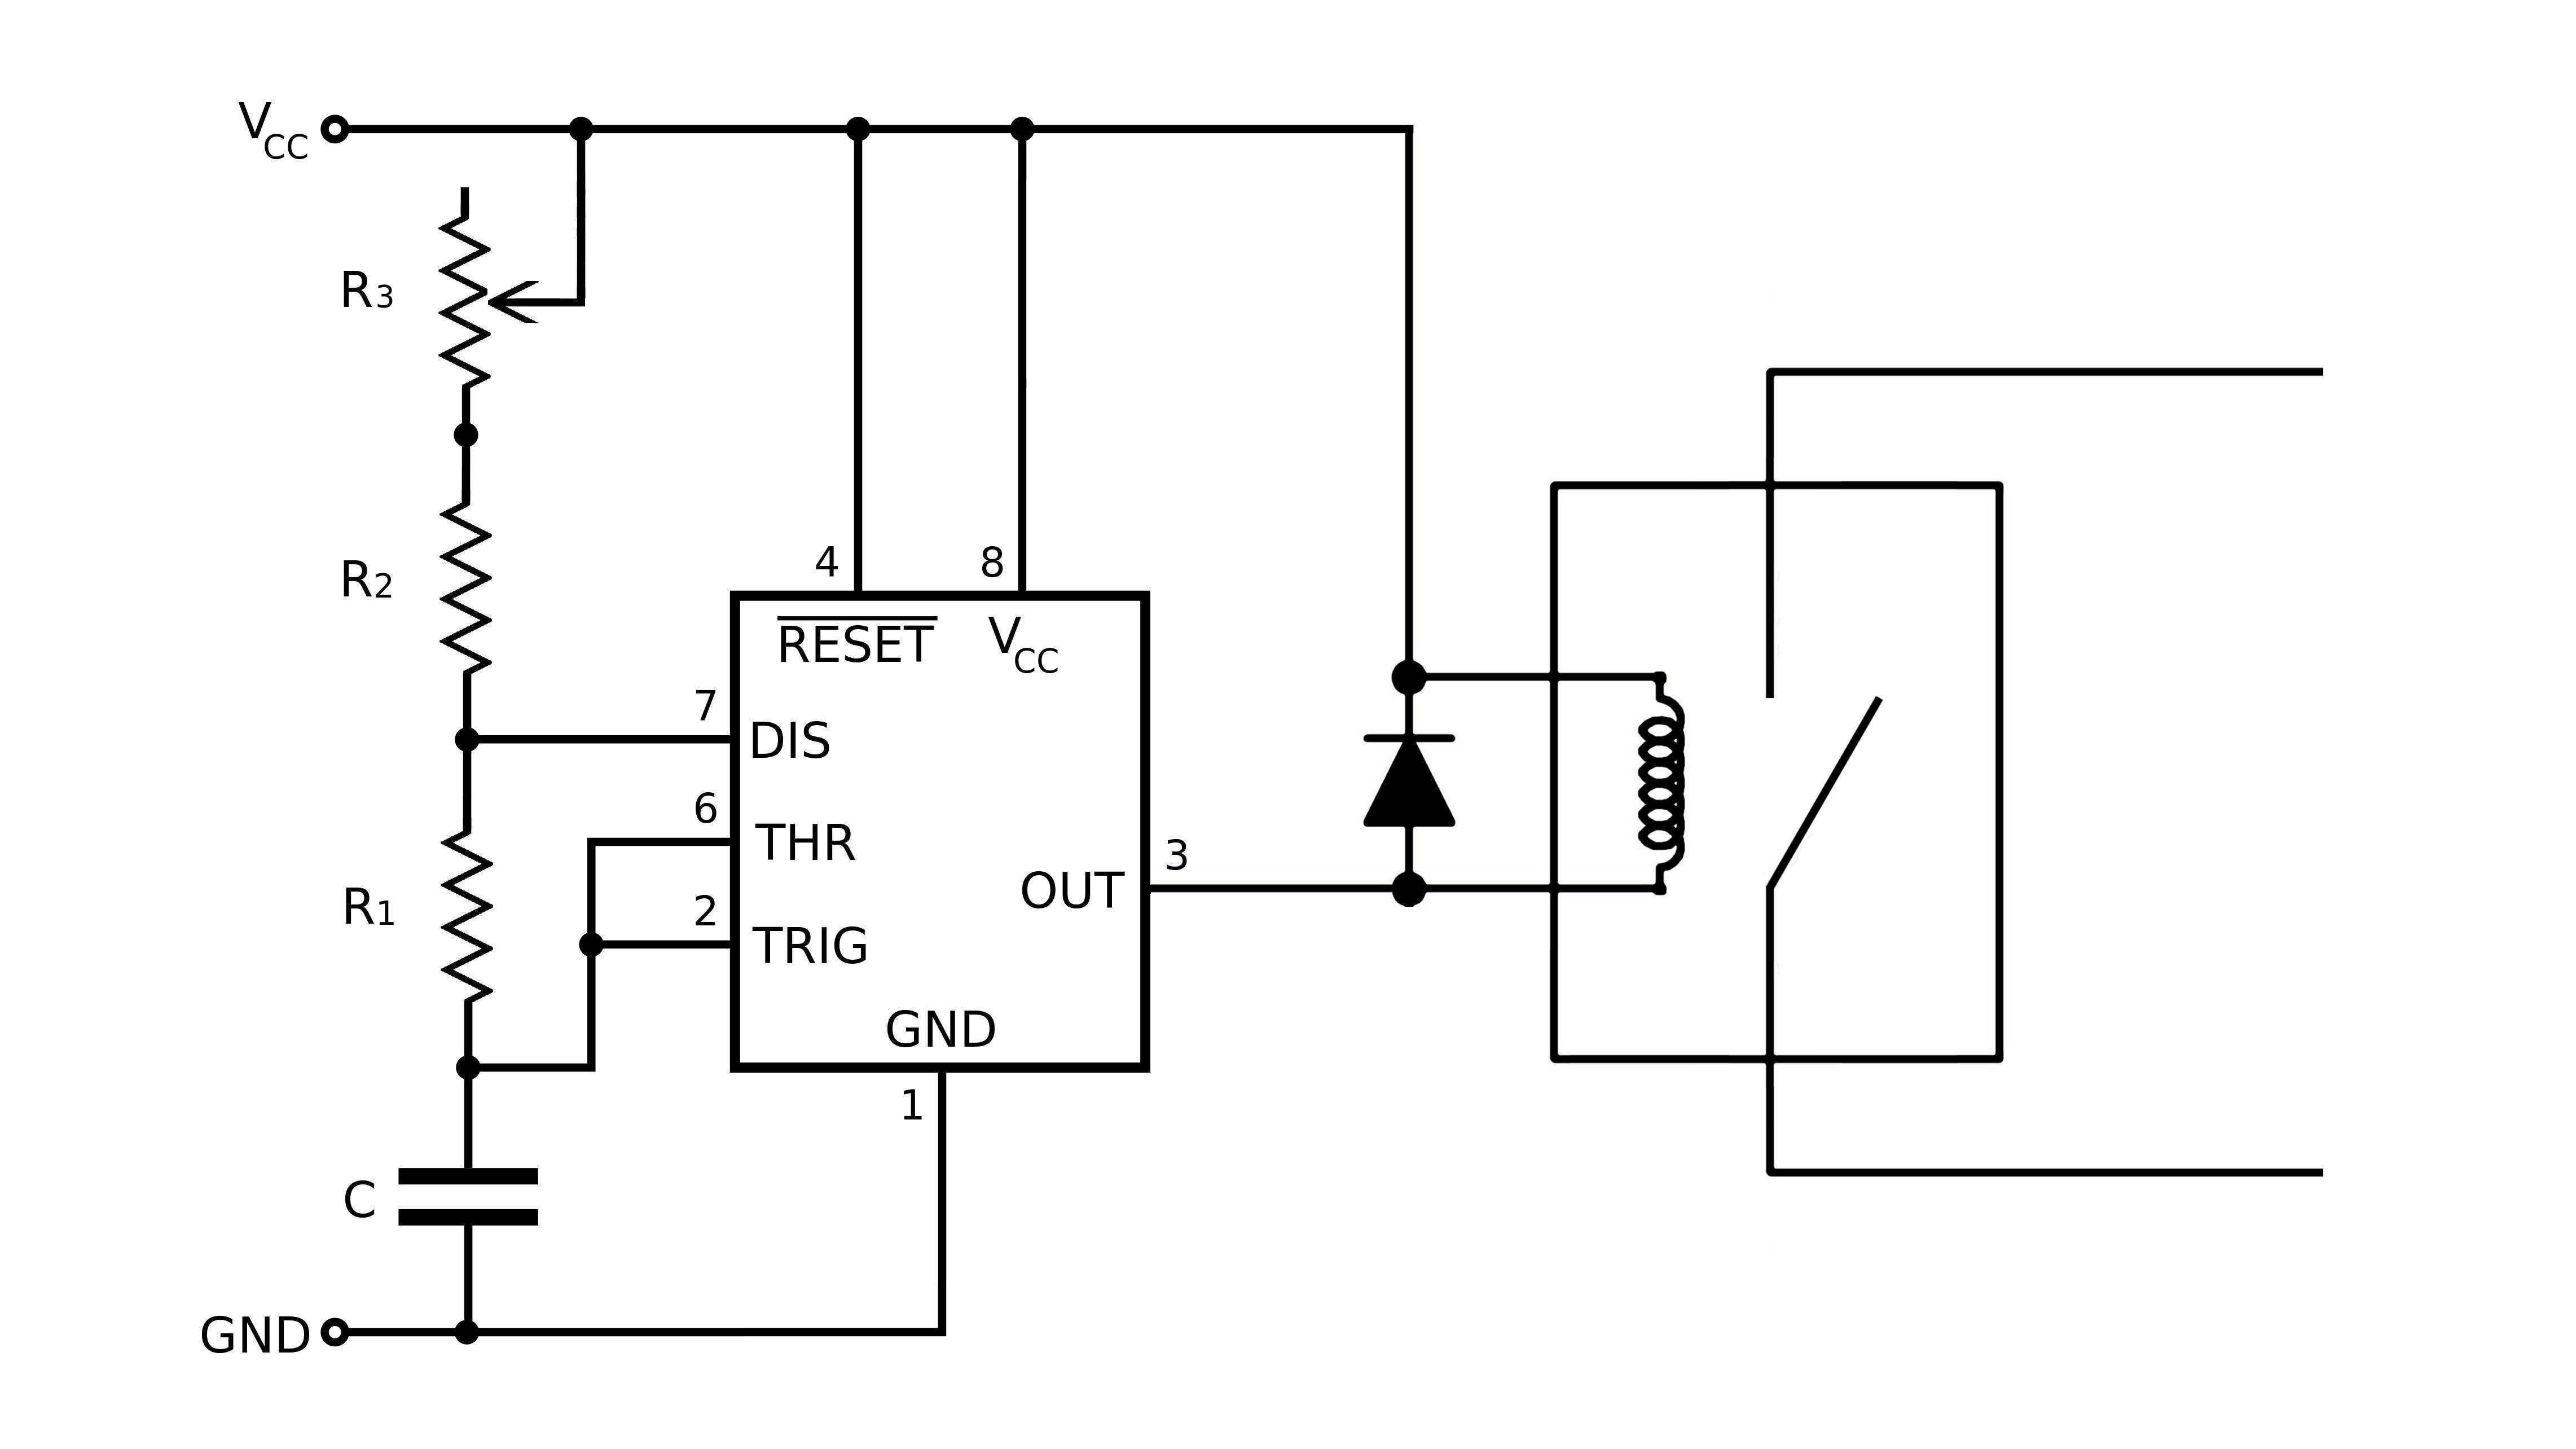 220V Welder Wiring Diagram | Wiring Library - 220V Welder Plug Wiring Diagram